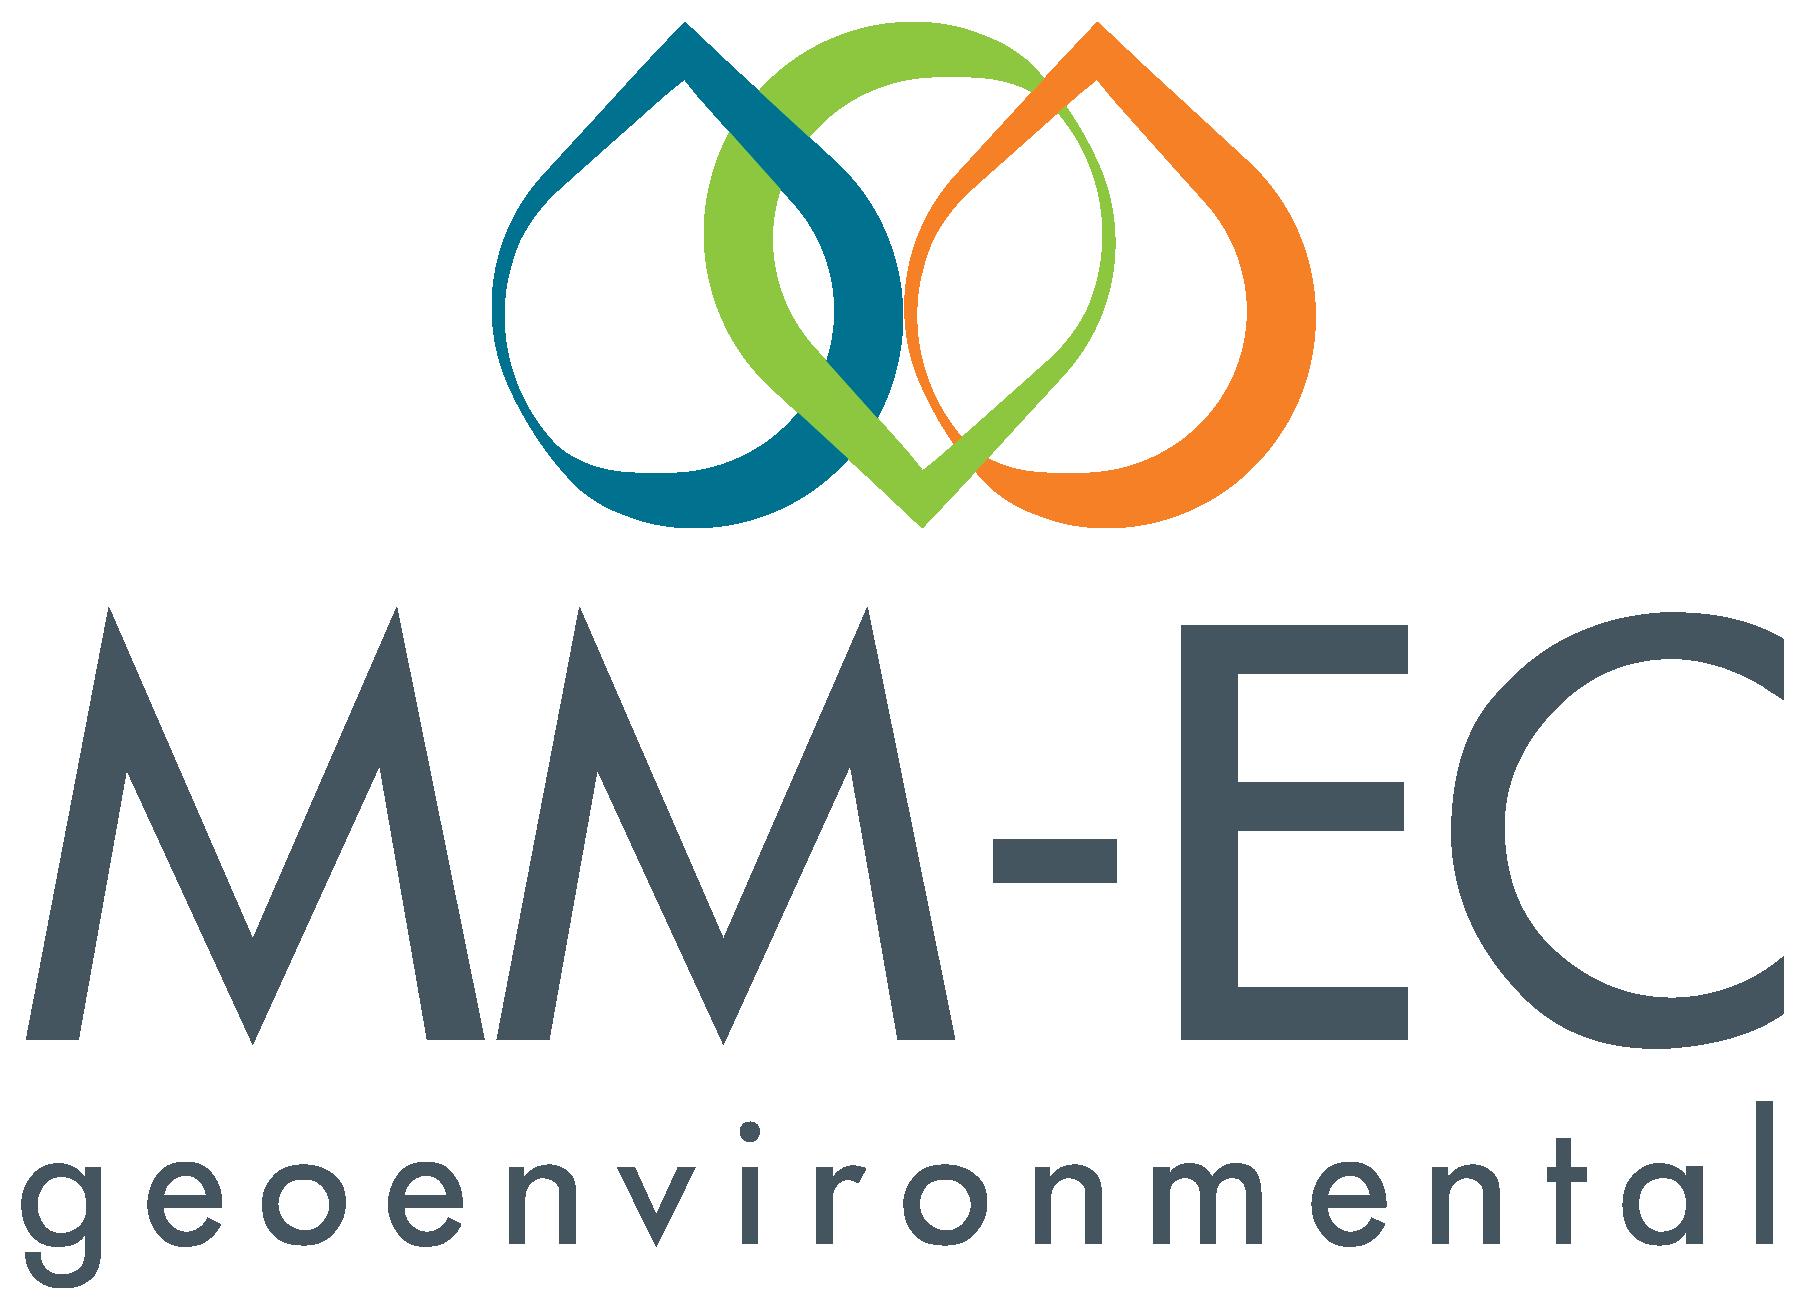 MM-EC